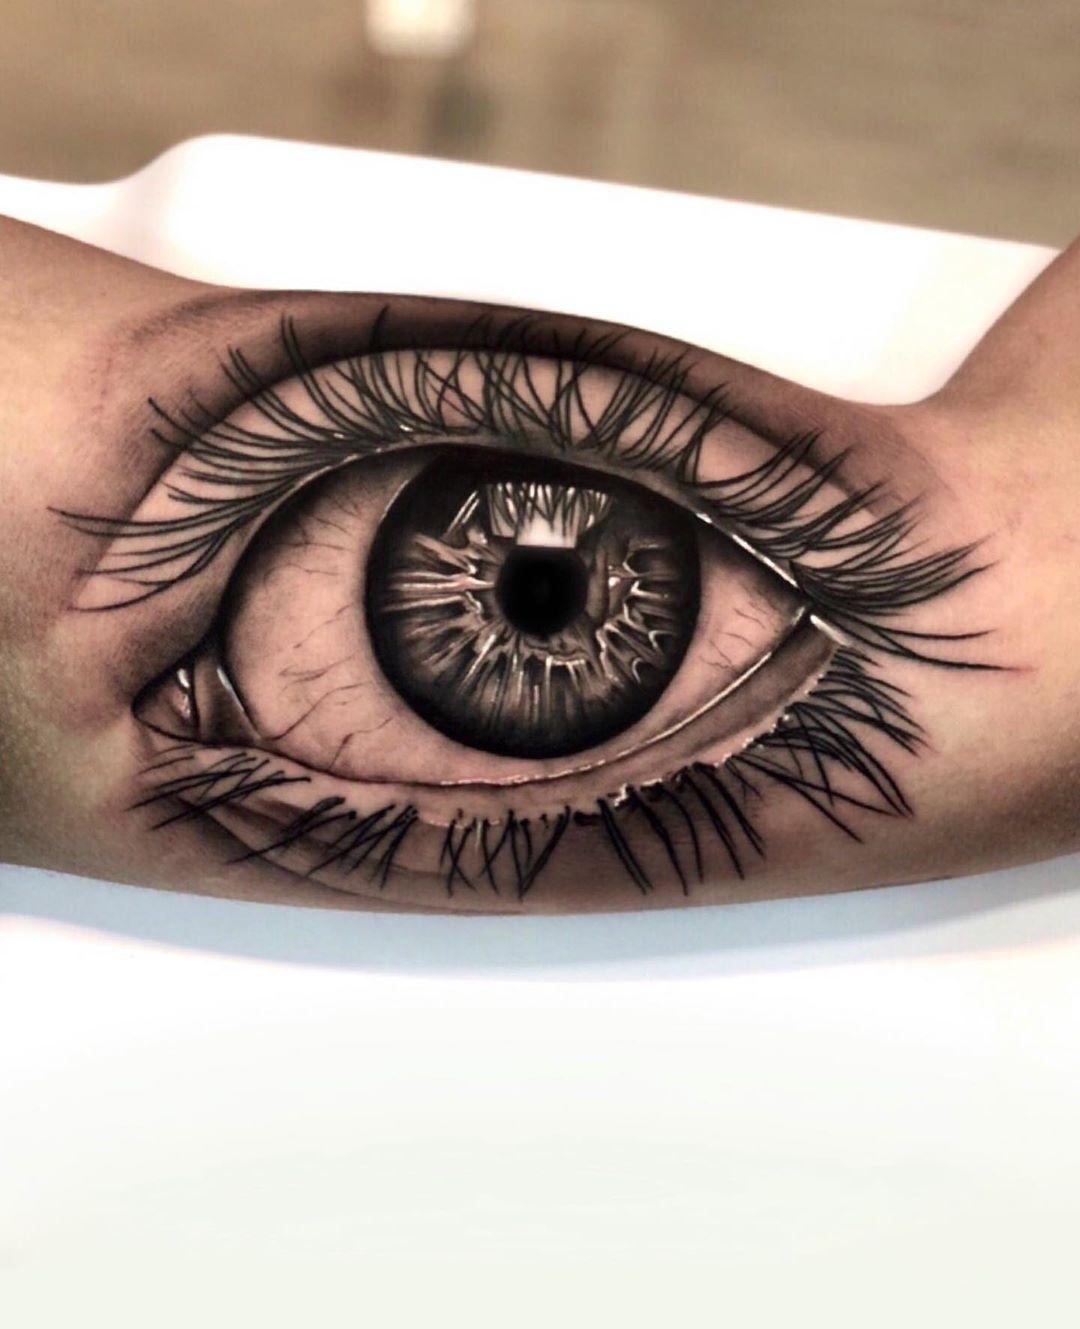 followforfollow,berlin,followmeciudadreal,ciudadreal,tomelloso,almagro,puertollano,tatuajesenpuertollano,tatuajesendaimiel,ciudadrealtattoo,cciudadrealtatuajes,tatuajesciudadreal,follow,ciudadrealtatuajes,puertollano,tattooers,besttattooers,juantabasco,ciudadrealsetatua,ink,tatuajes,realiismo,realistictattoo,ciudadrealtattoo,tatuajesenpuertollano,traditionaltattoos,castillalamancha